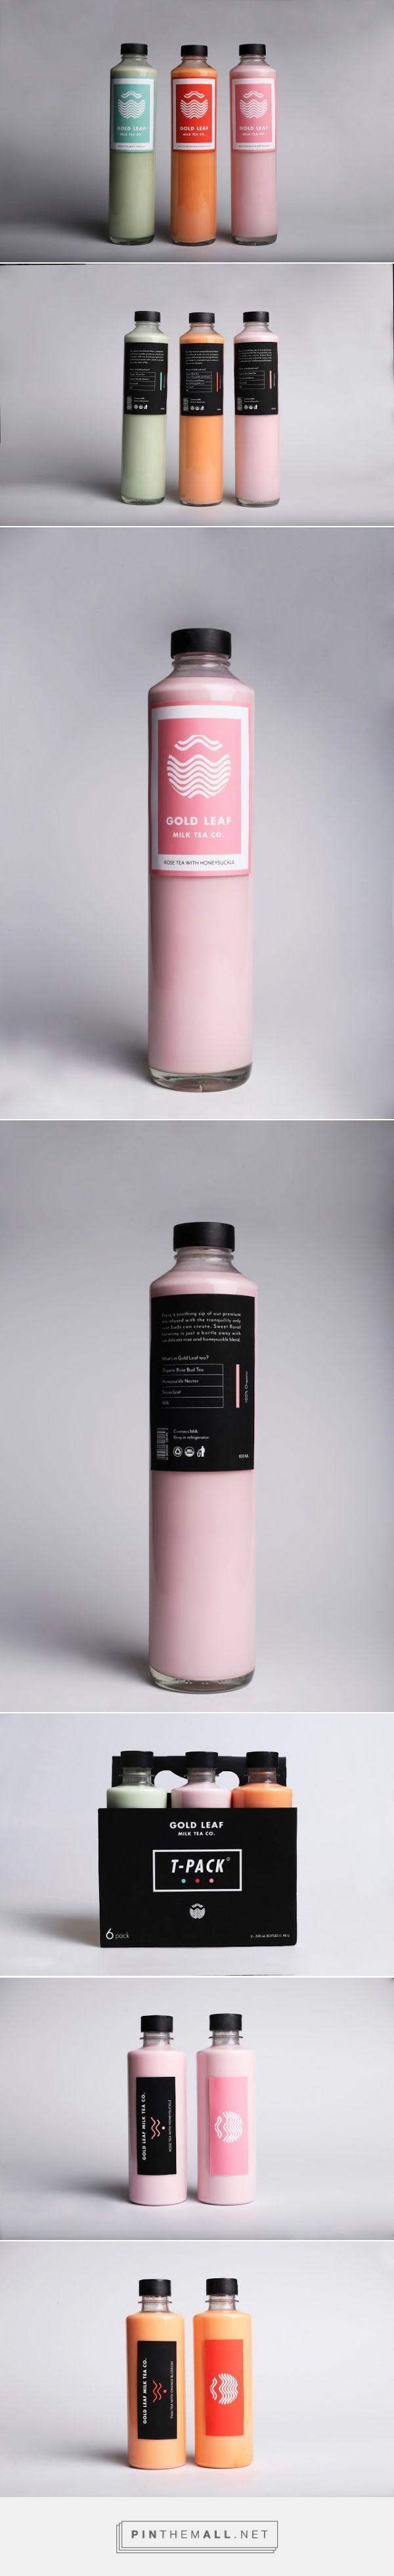 GoldLeaf Milk Tea Co. (Student Project) packaging design by Adam Heisig